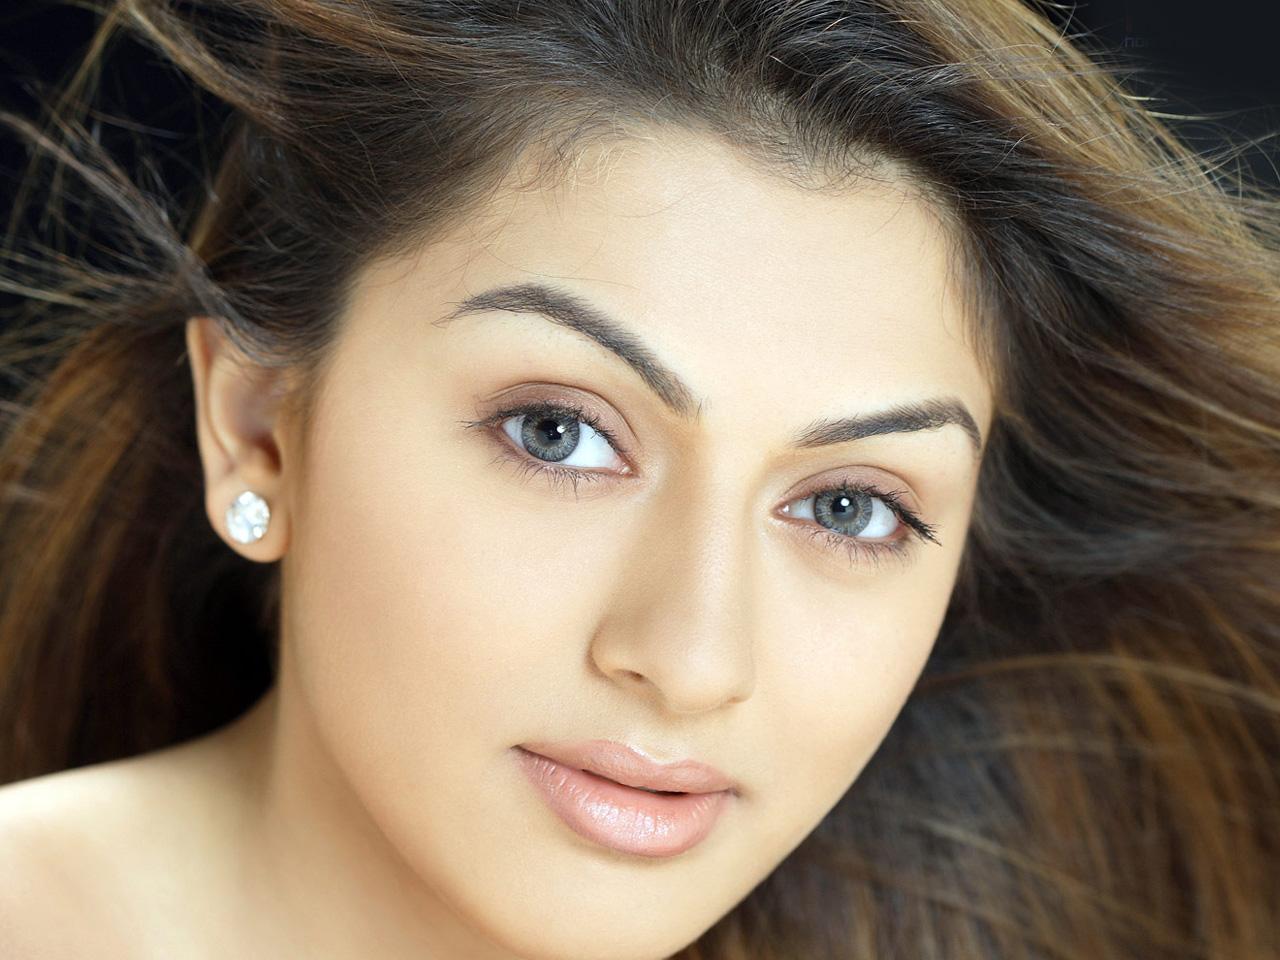 Shanvi Cute Hd Wallpapers All Hd Wallpapers Actress Hansika Motwani Wallpapers